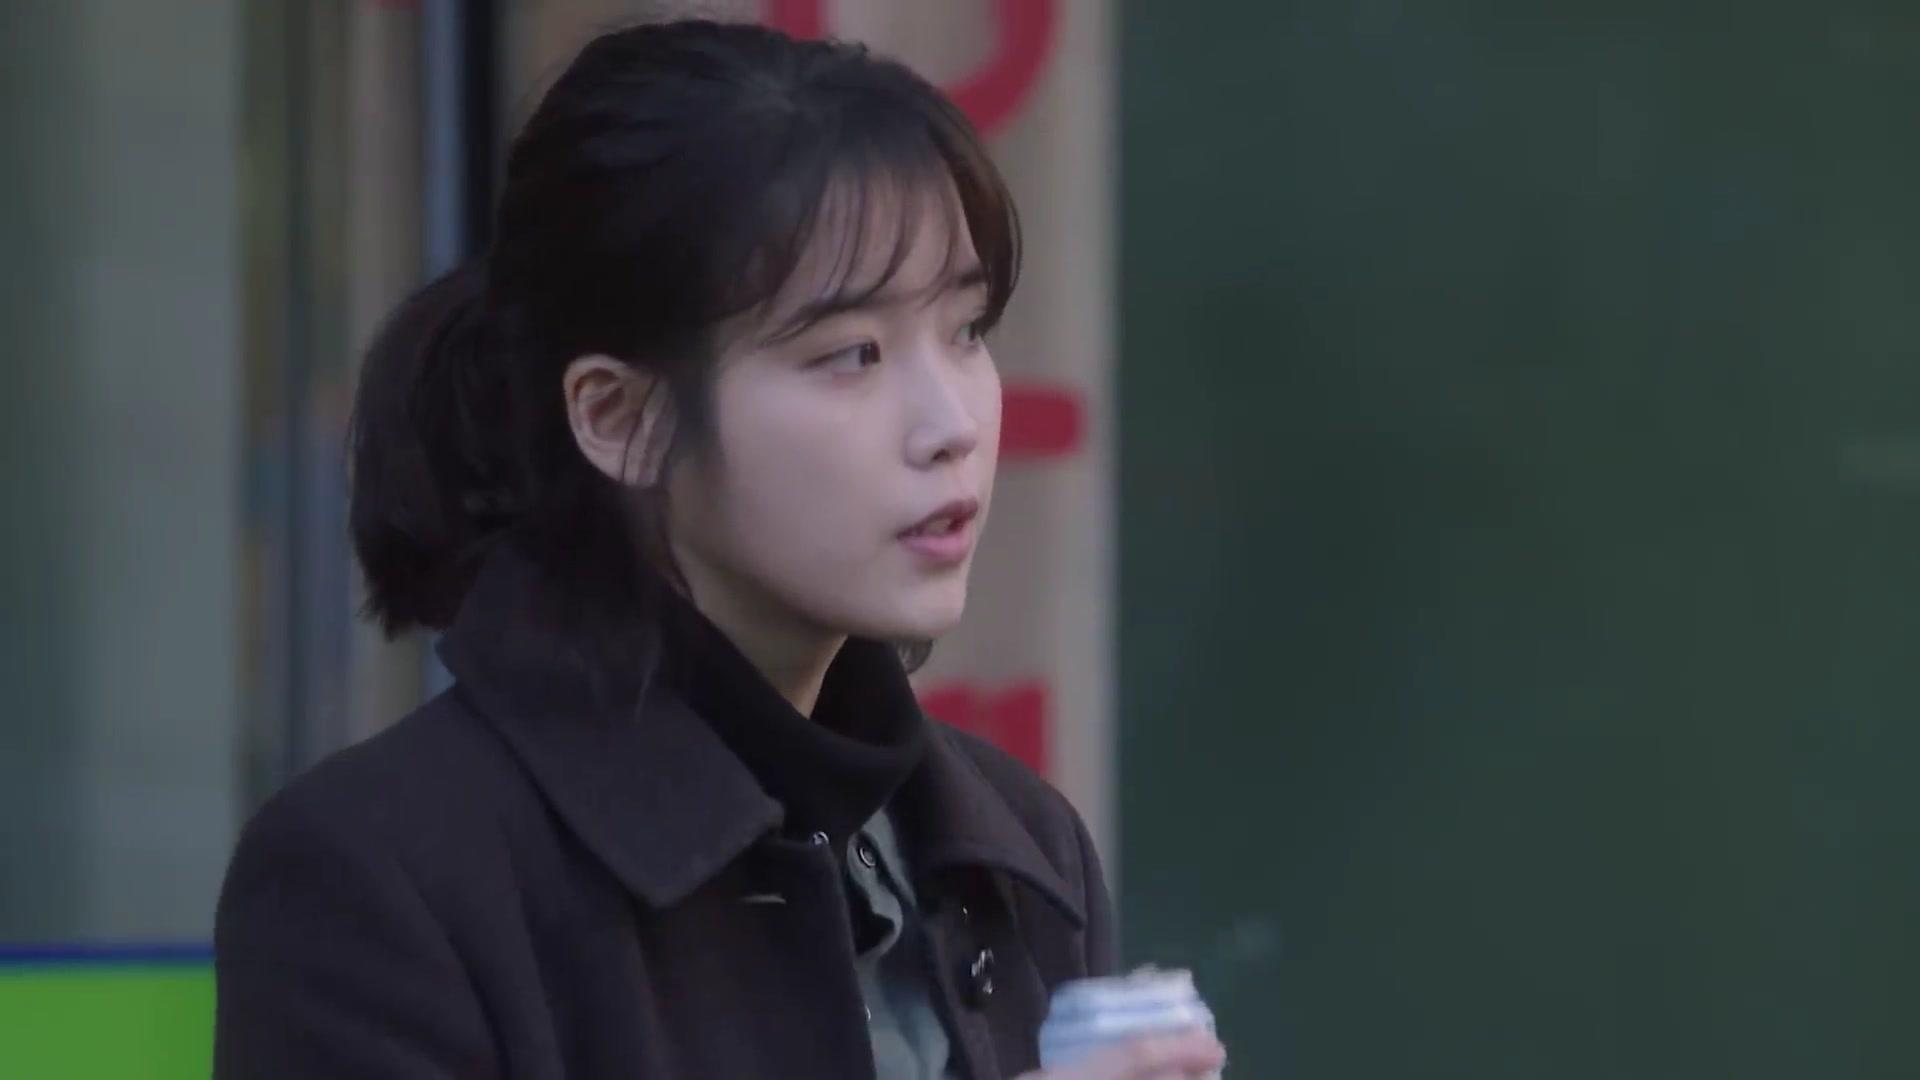 An Ordinary Day - Jung Seung Hwan